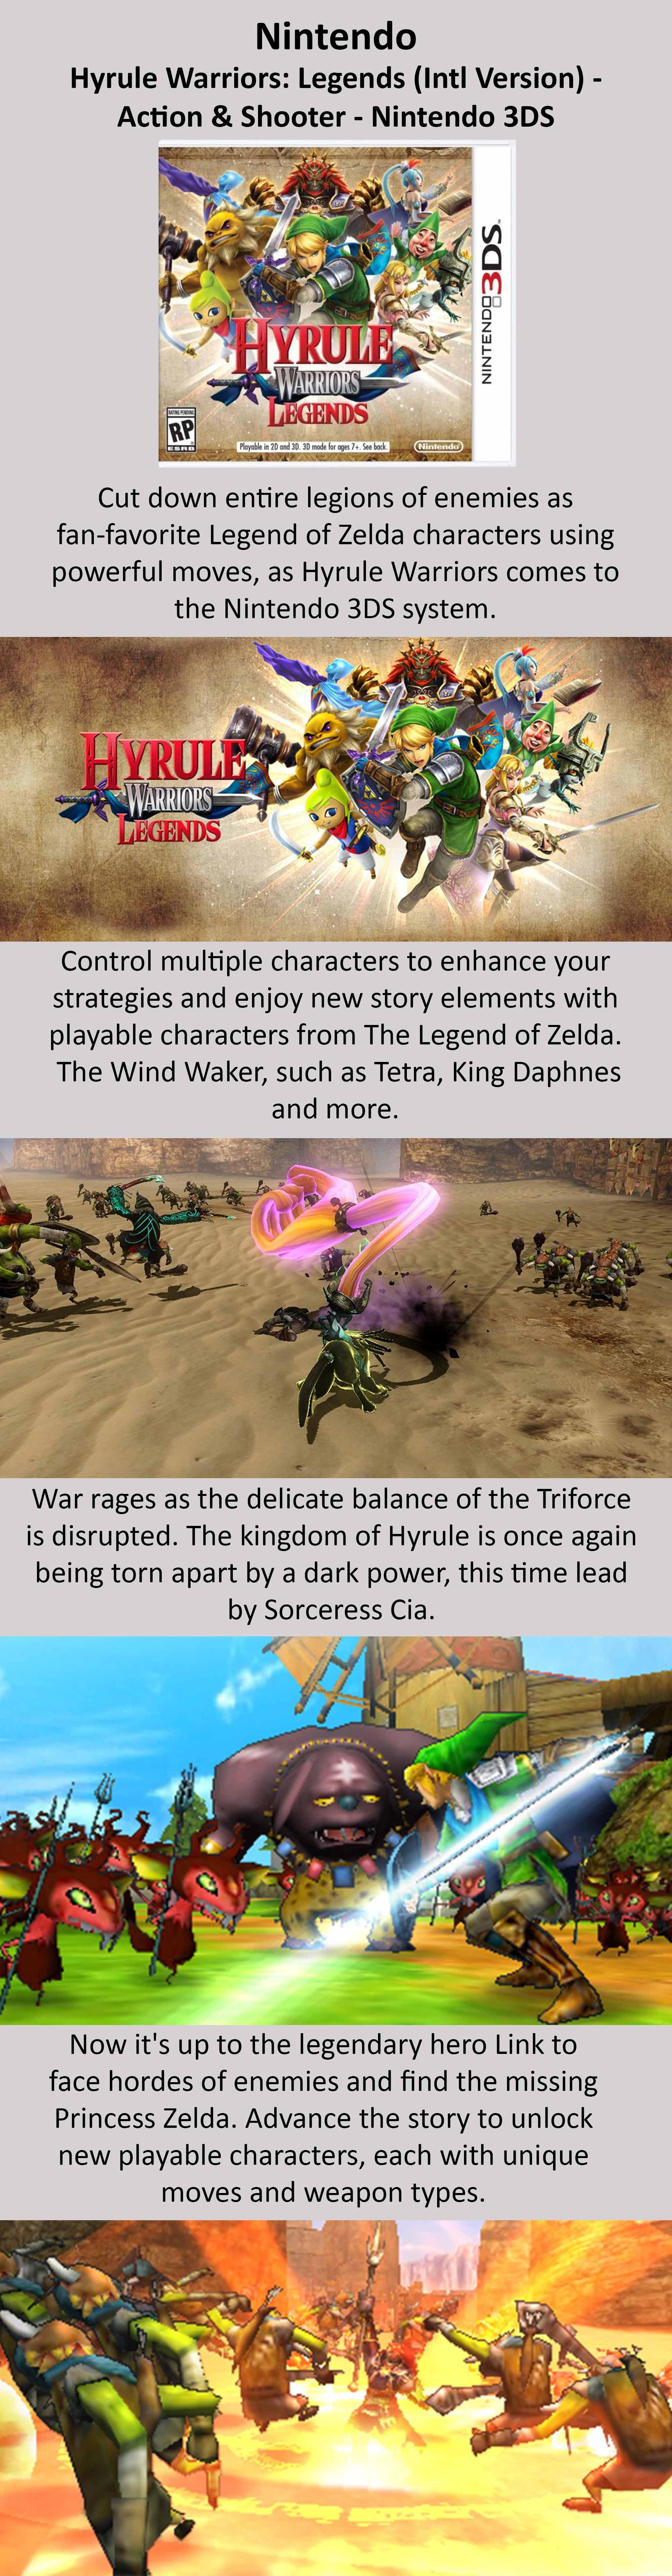 Shop Nintendo Hyrule Warriors Legends Intl Version Nintendo 3ds Online In Dubai Abu Dhabi And All Uae